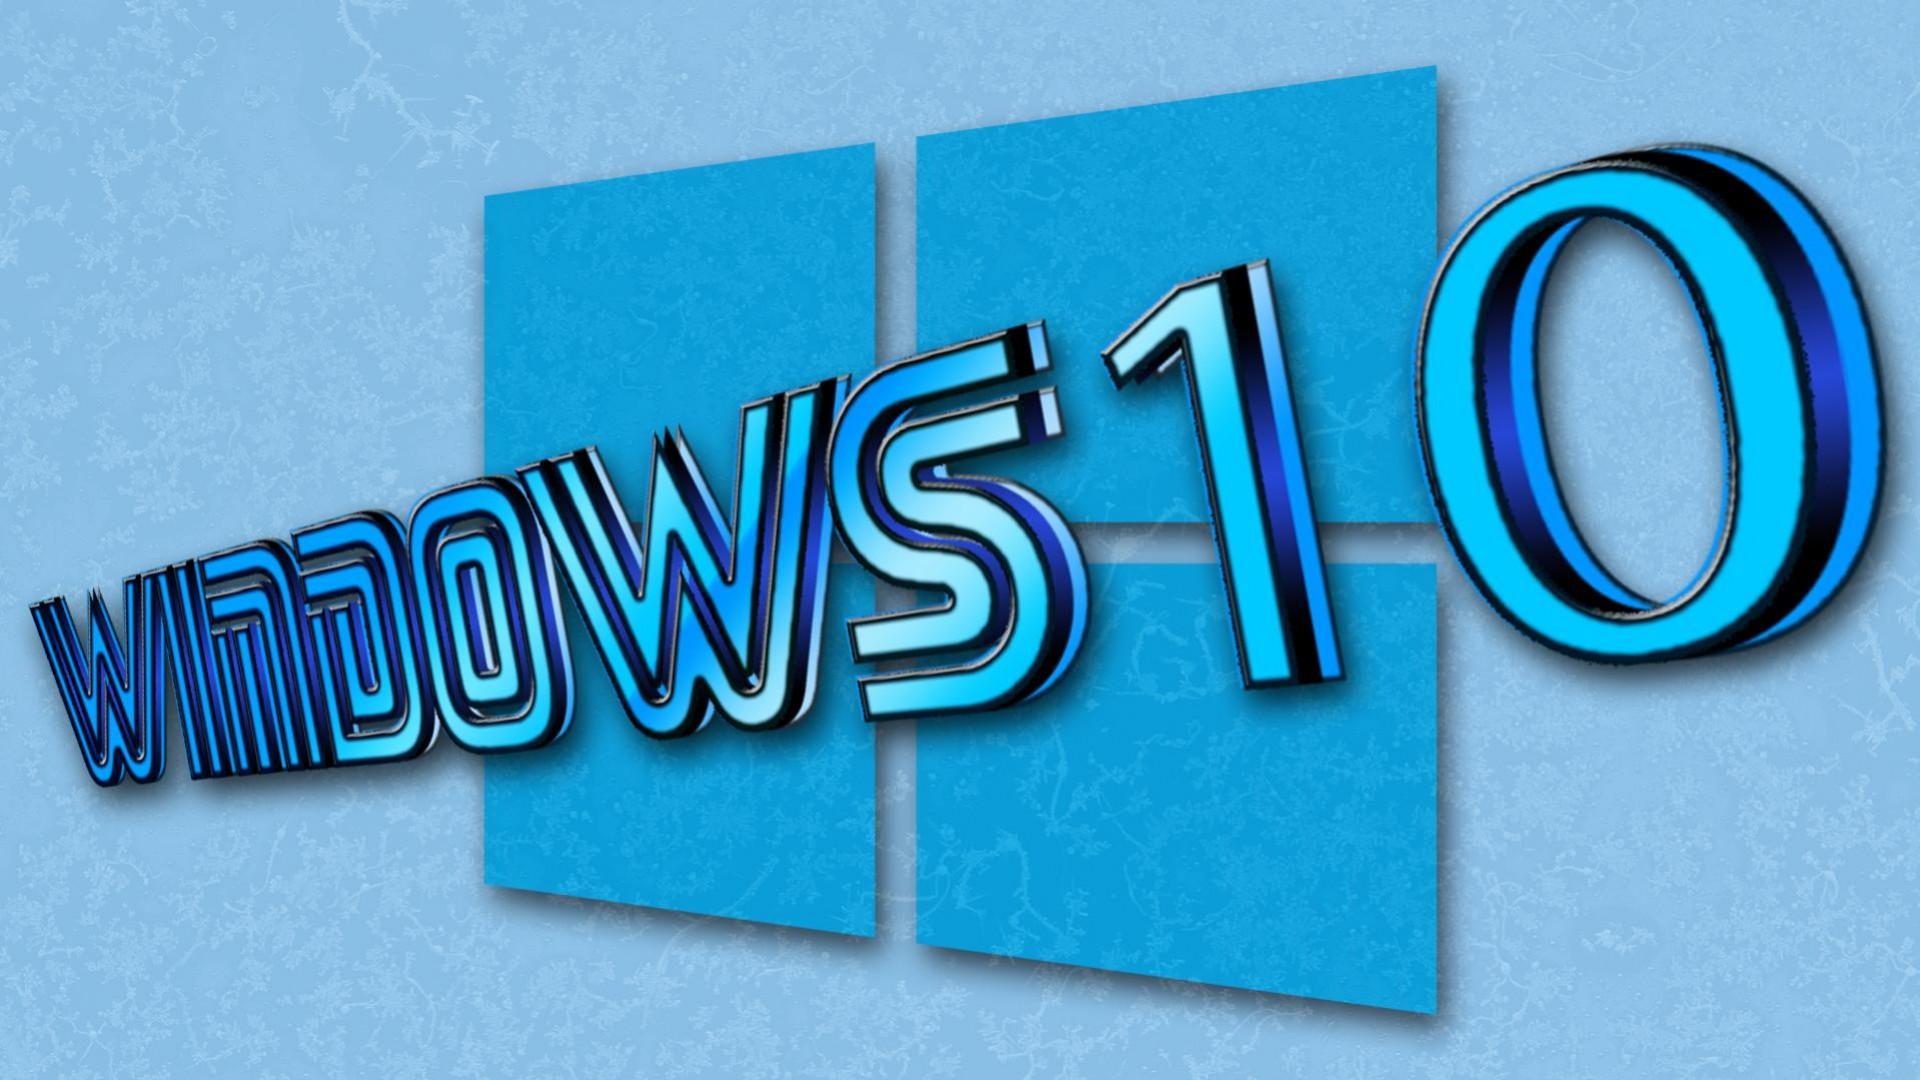 1080p wallpaper microsoft windows 10 logo MEMES 1920x1080